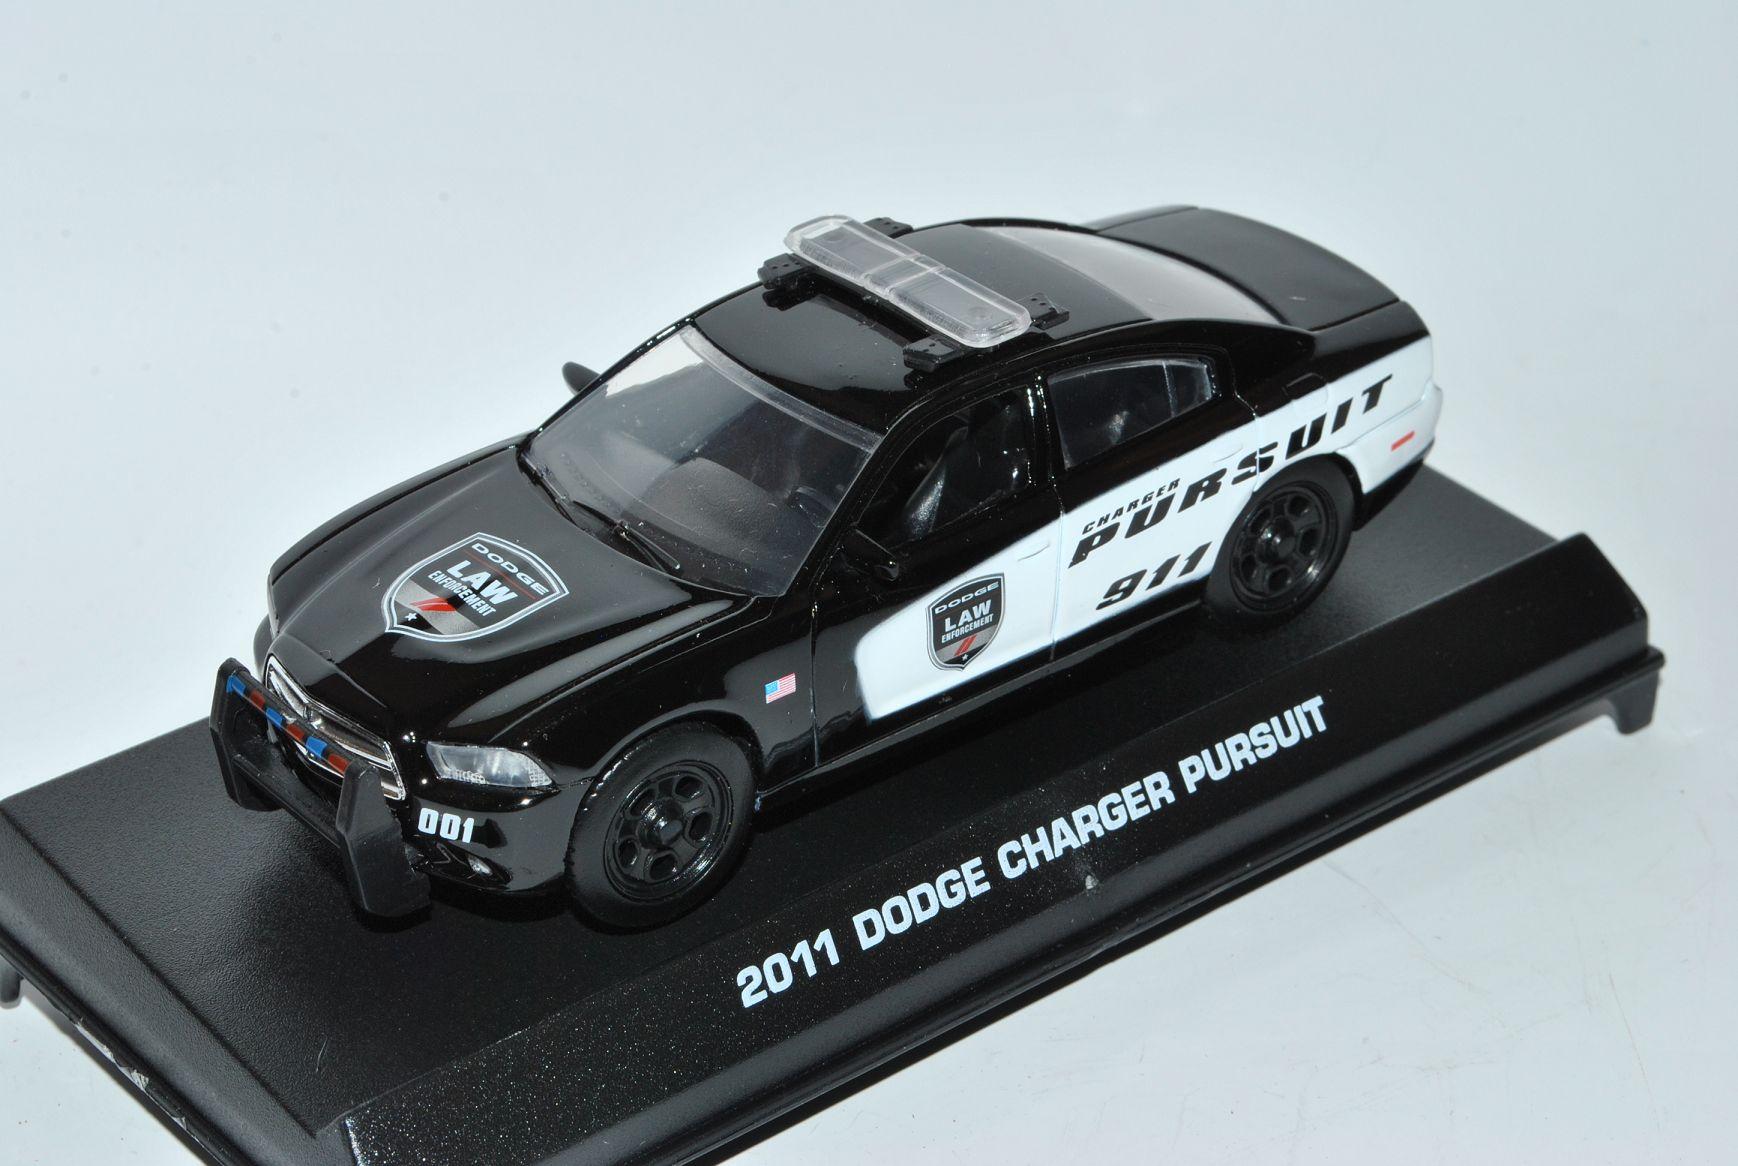 Dodge-Charger-Pursuit-2011-law-Police-911-policia-1-43-Motormax-modelo-coche-mie miniatura 6